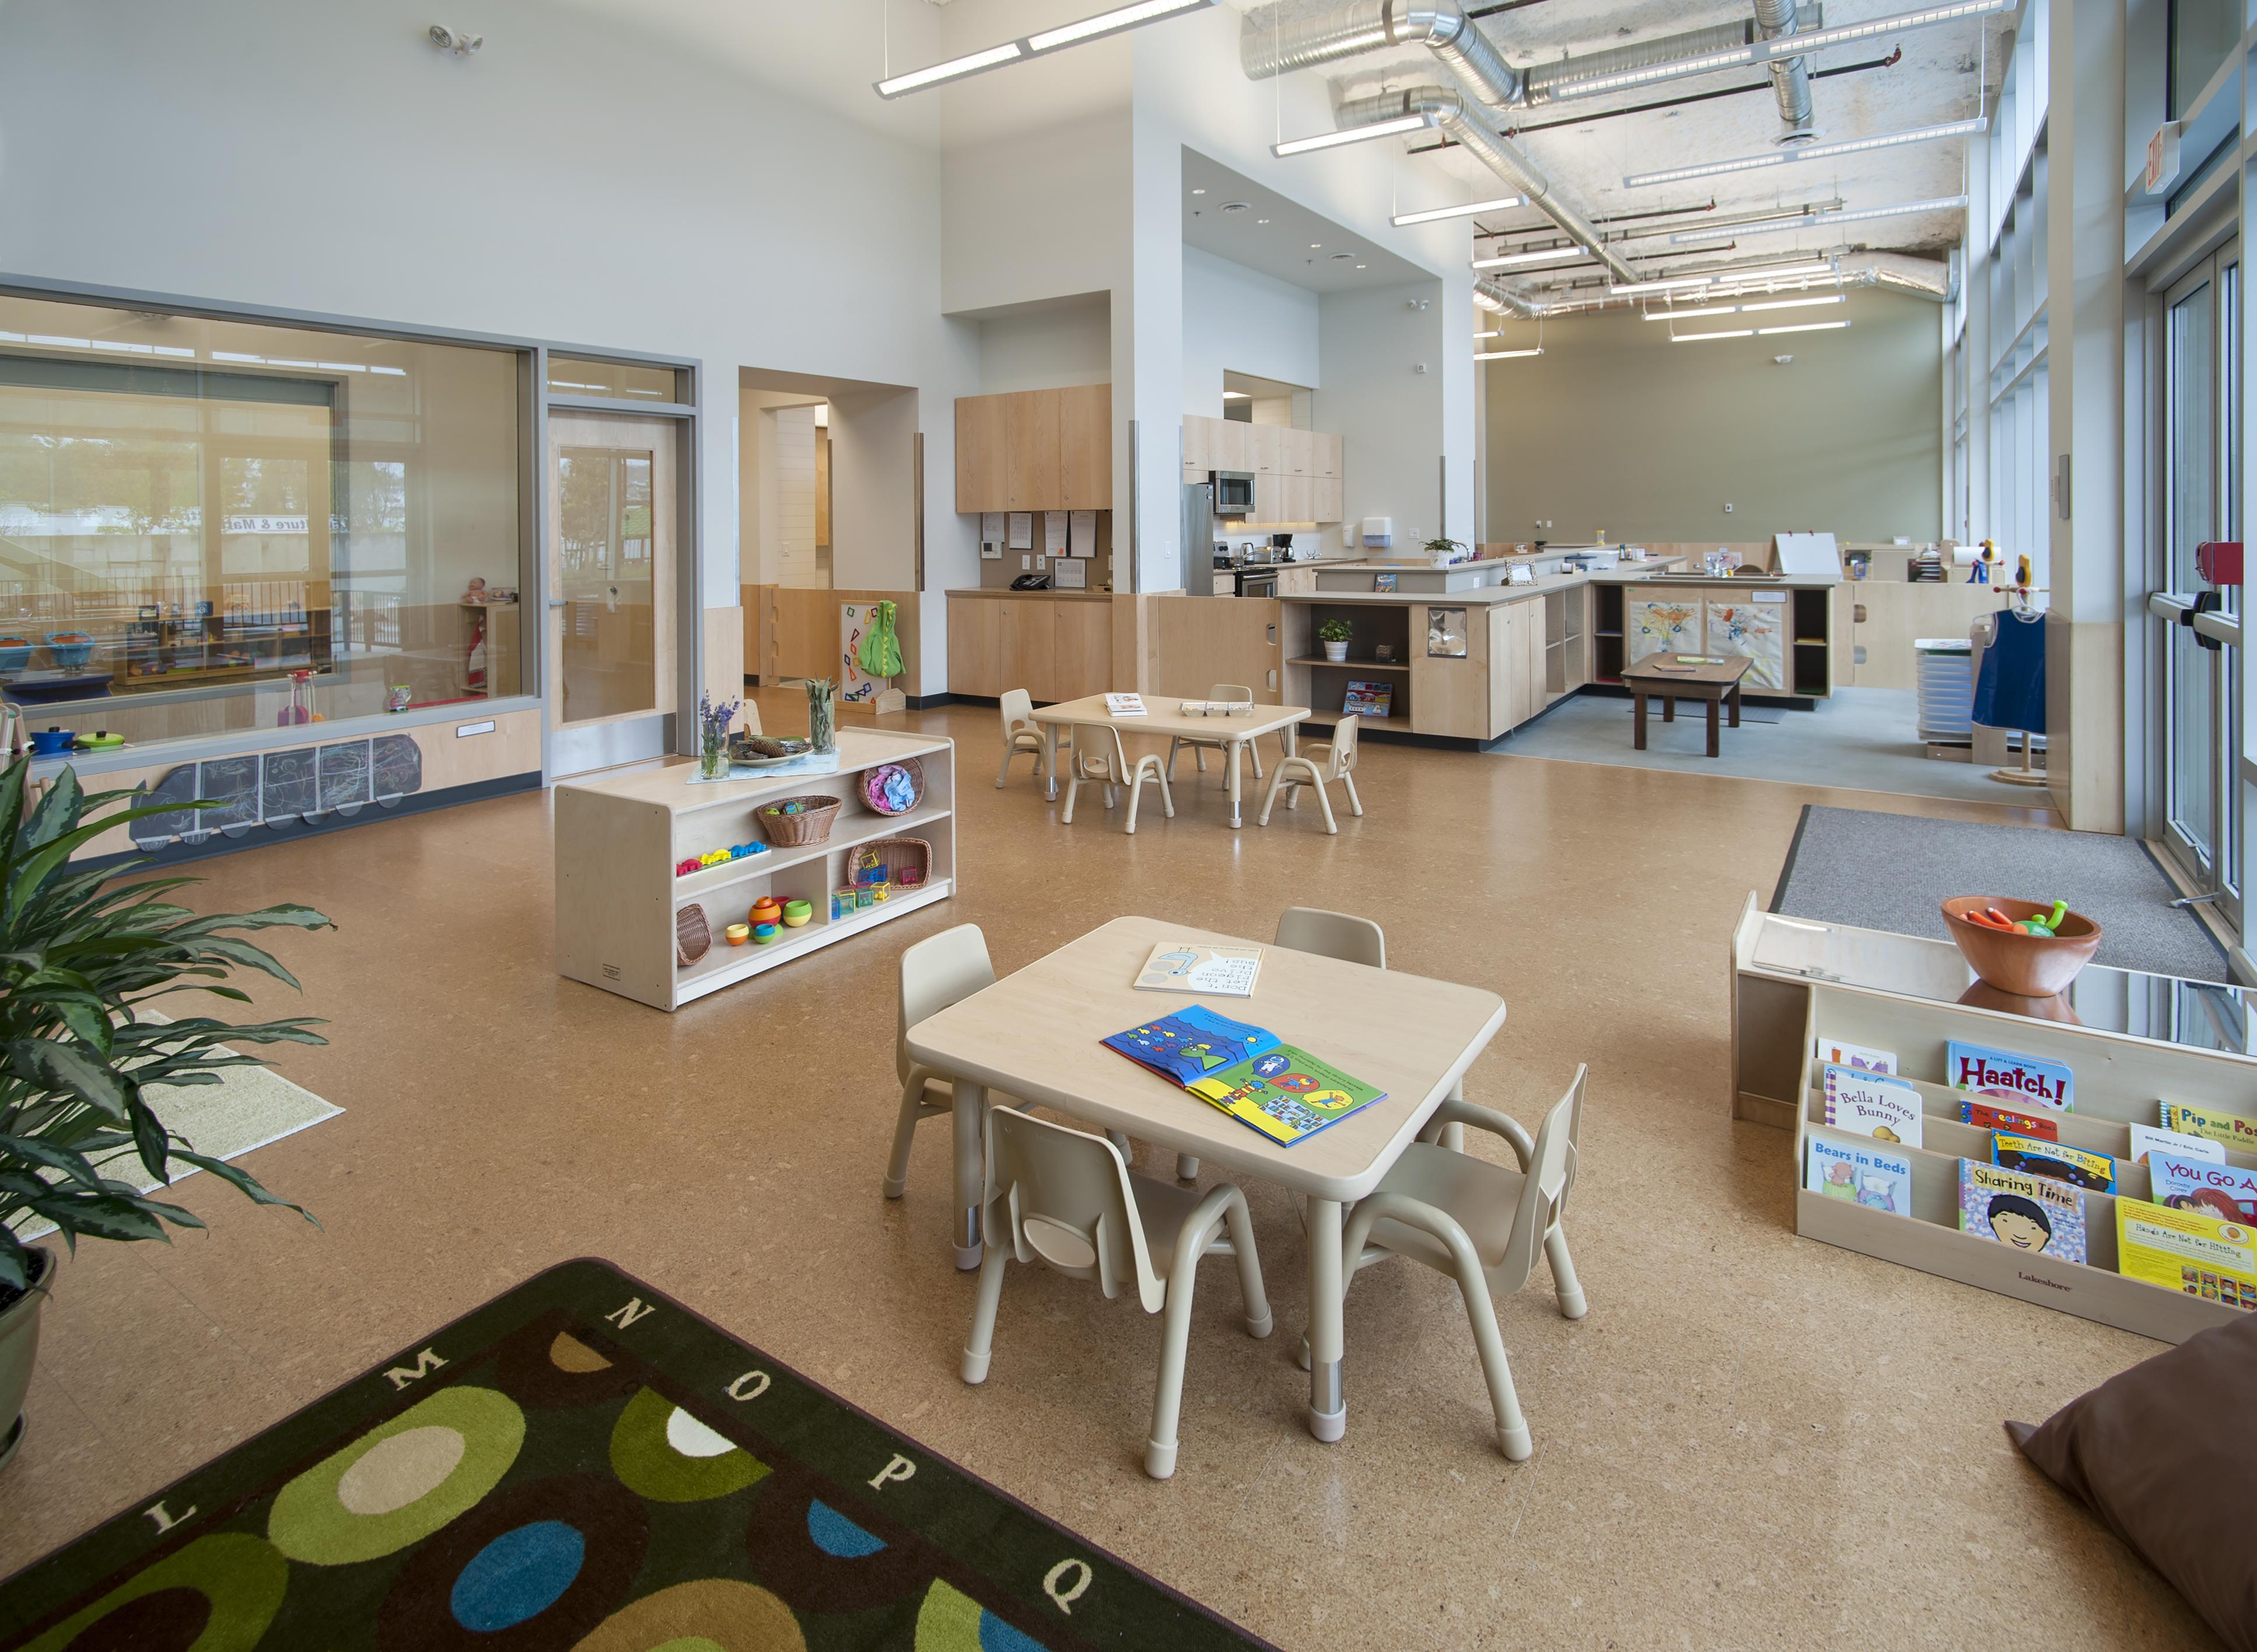 Renfrew Station YMCA Child Care Center